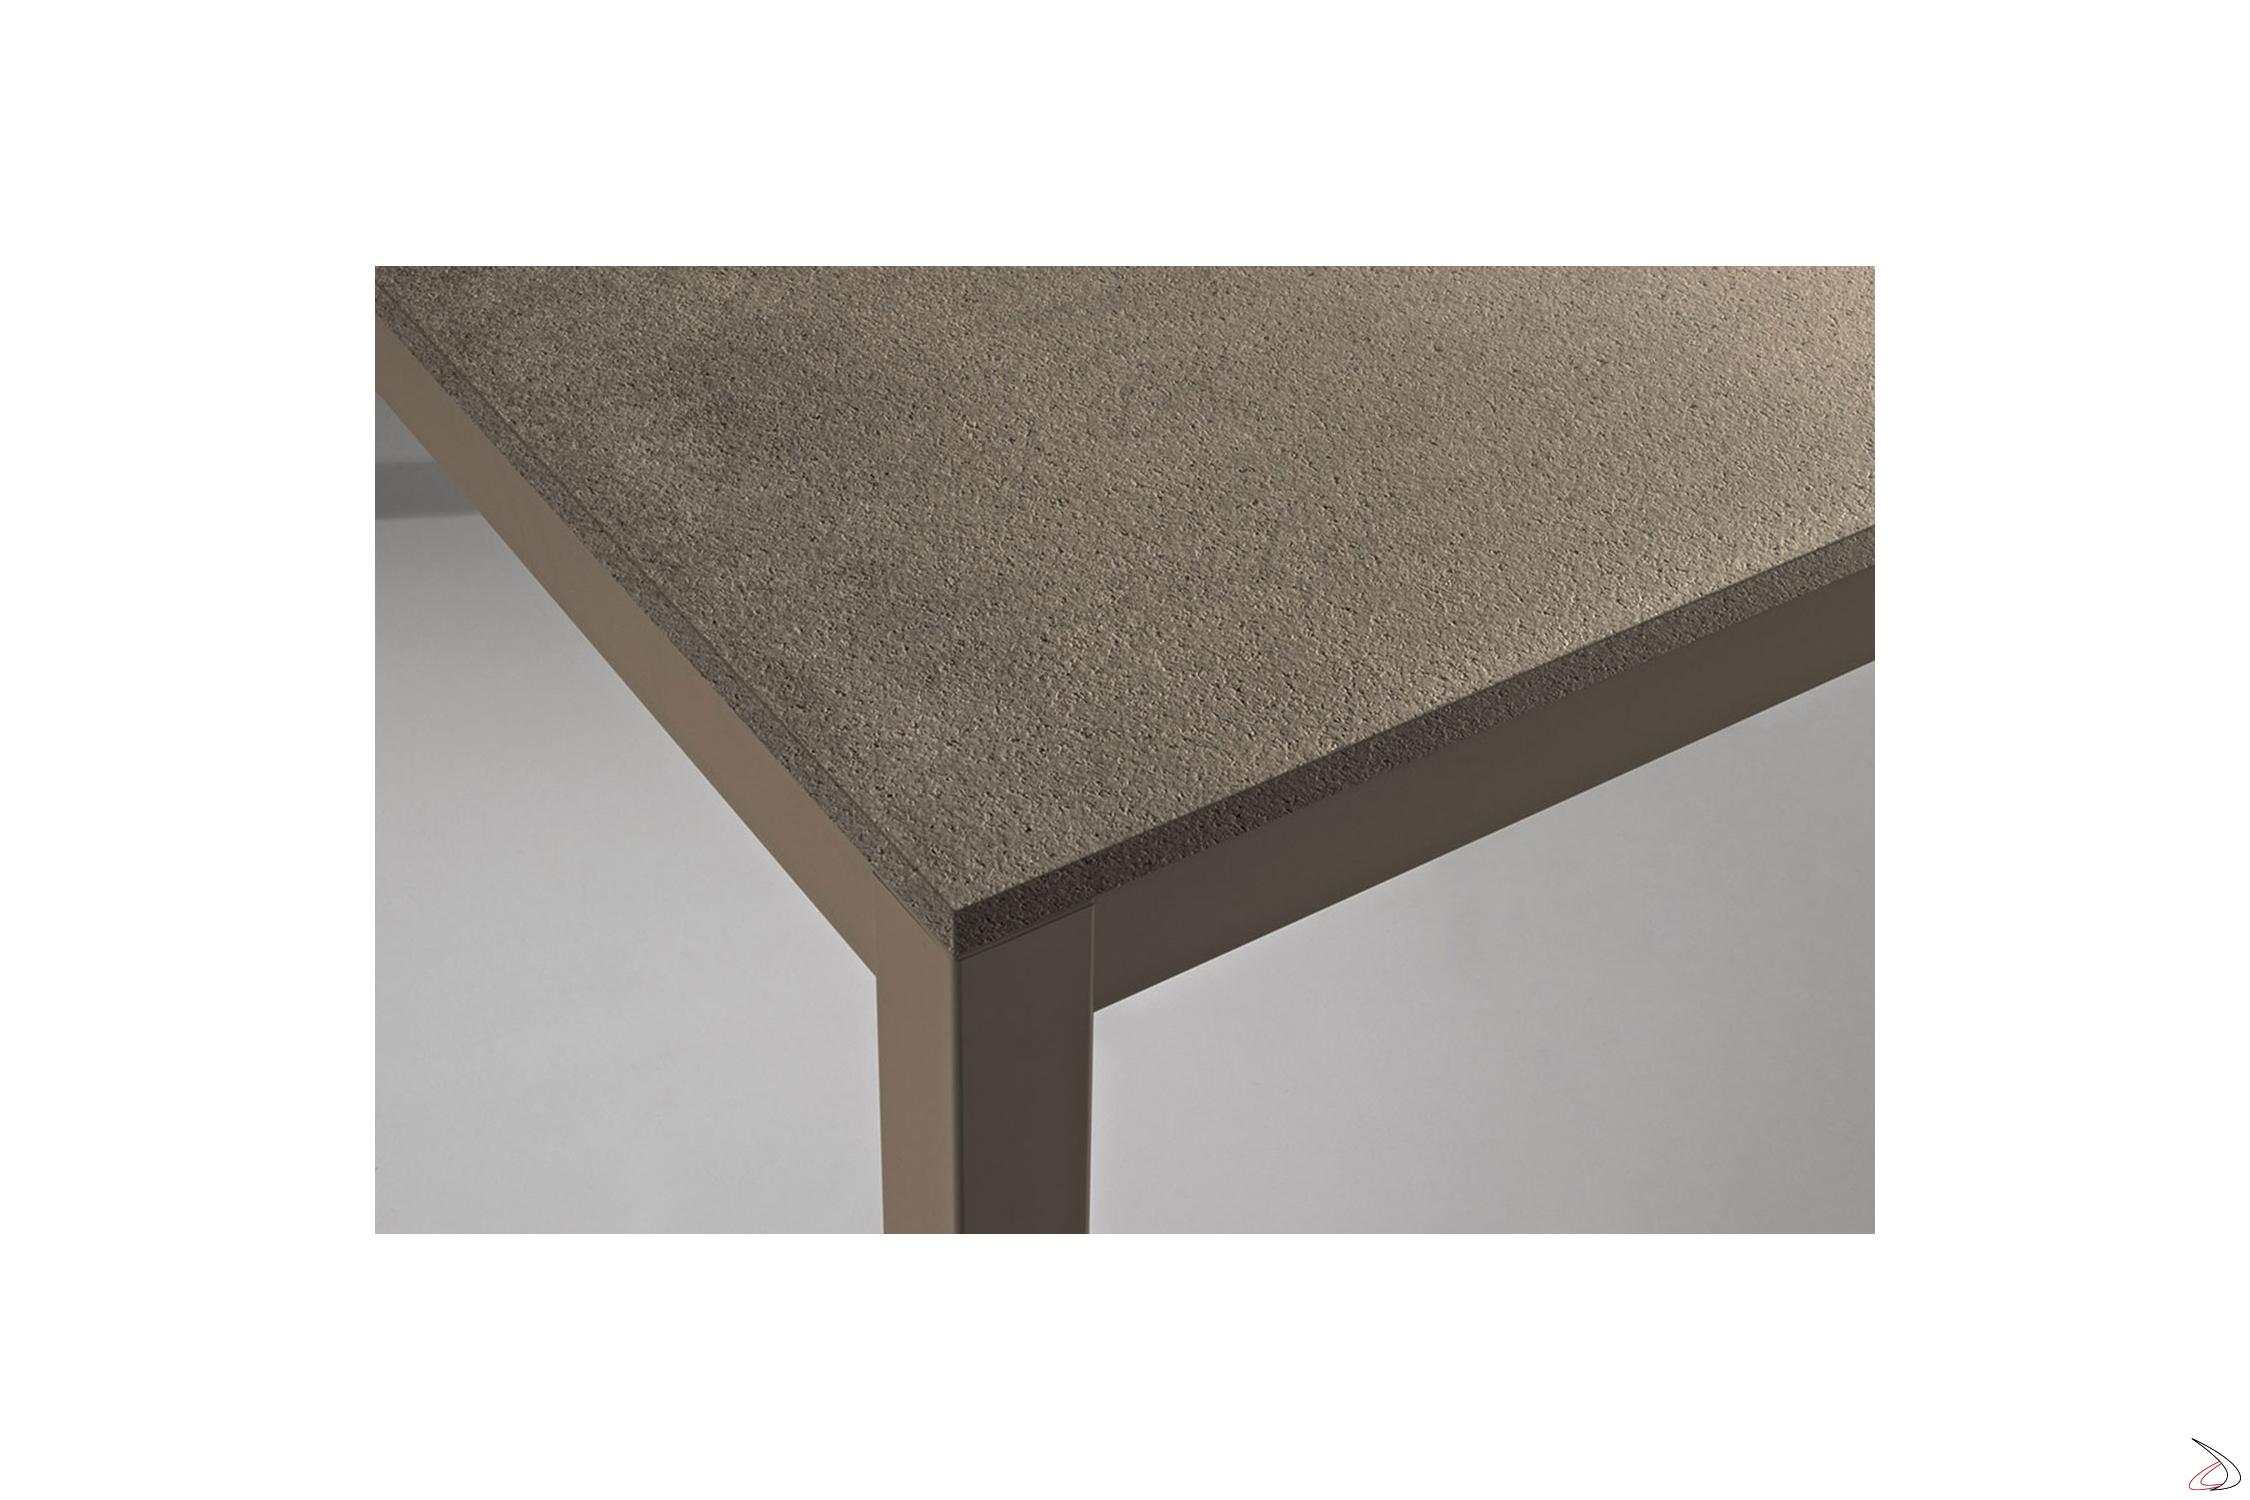 Moderner Rechteckiger Ausziehbarer Tisch Aus Metall Toparredi